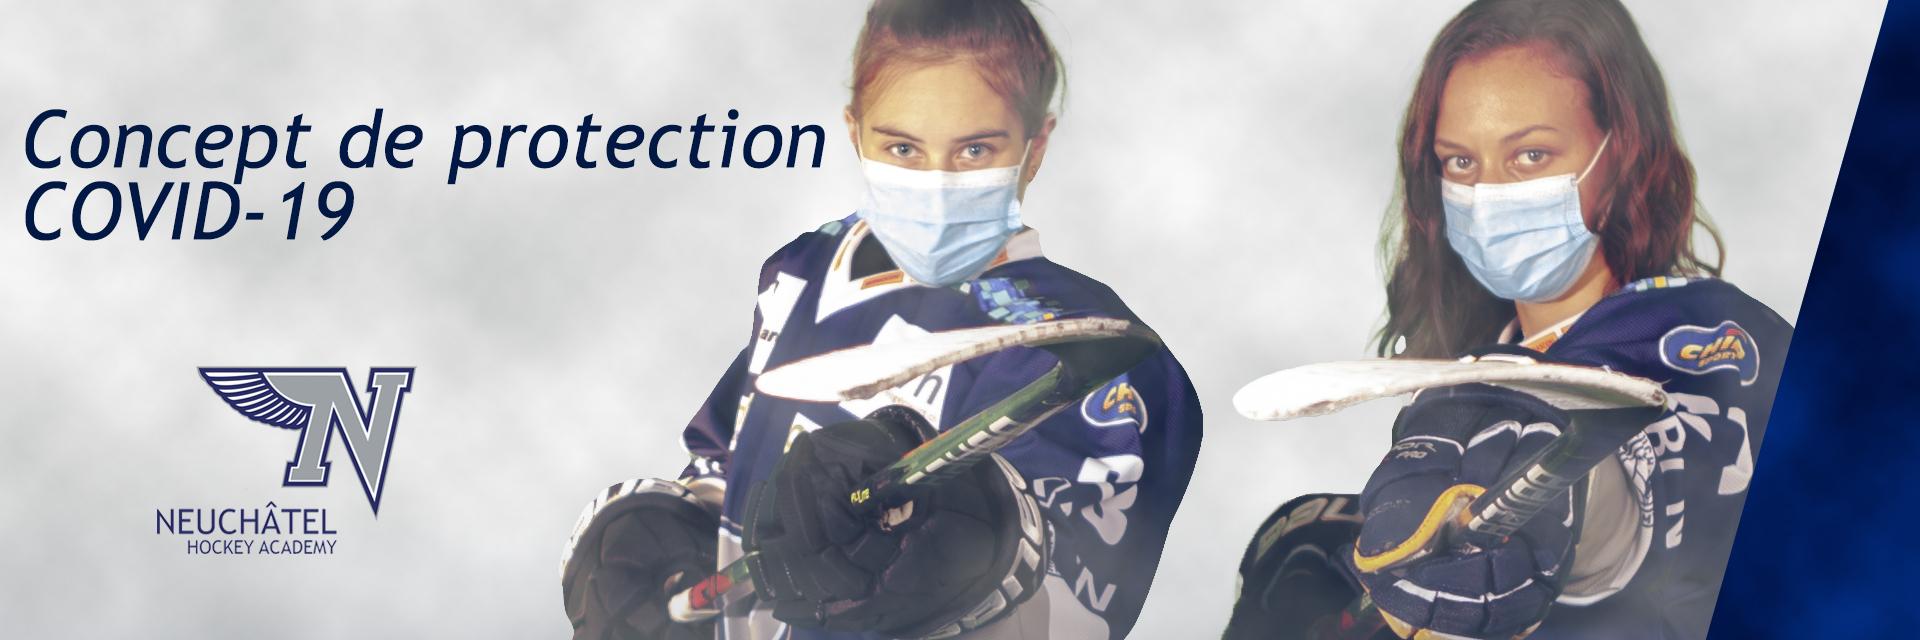 Concept protection covid 19